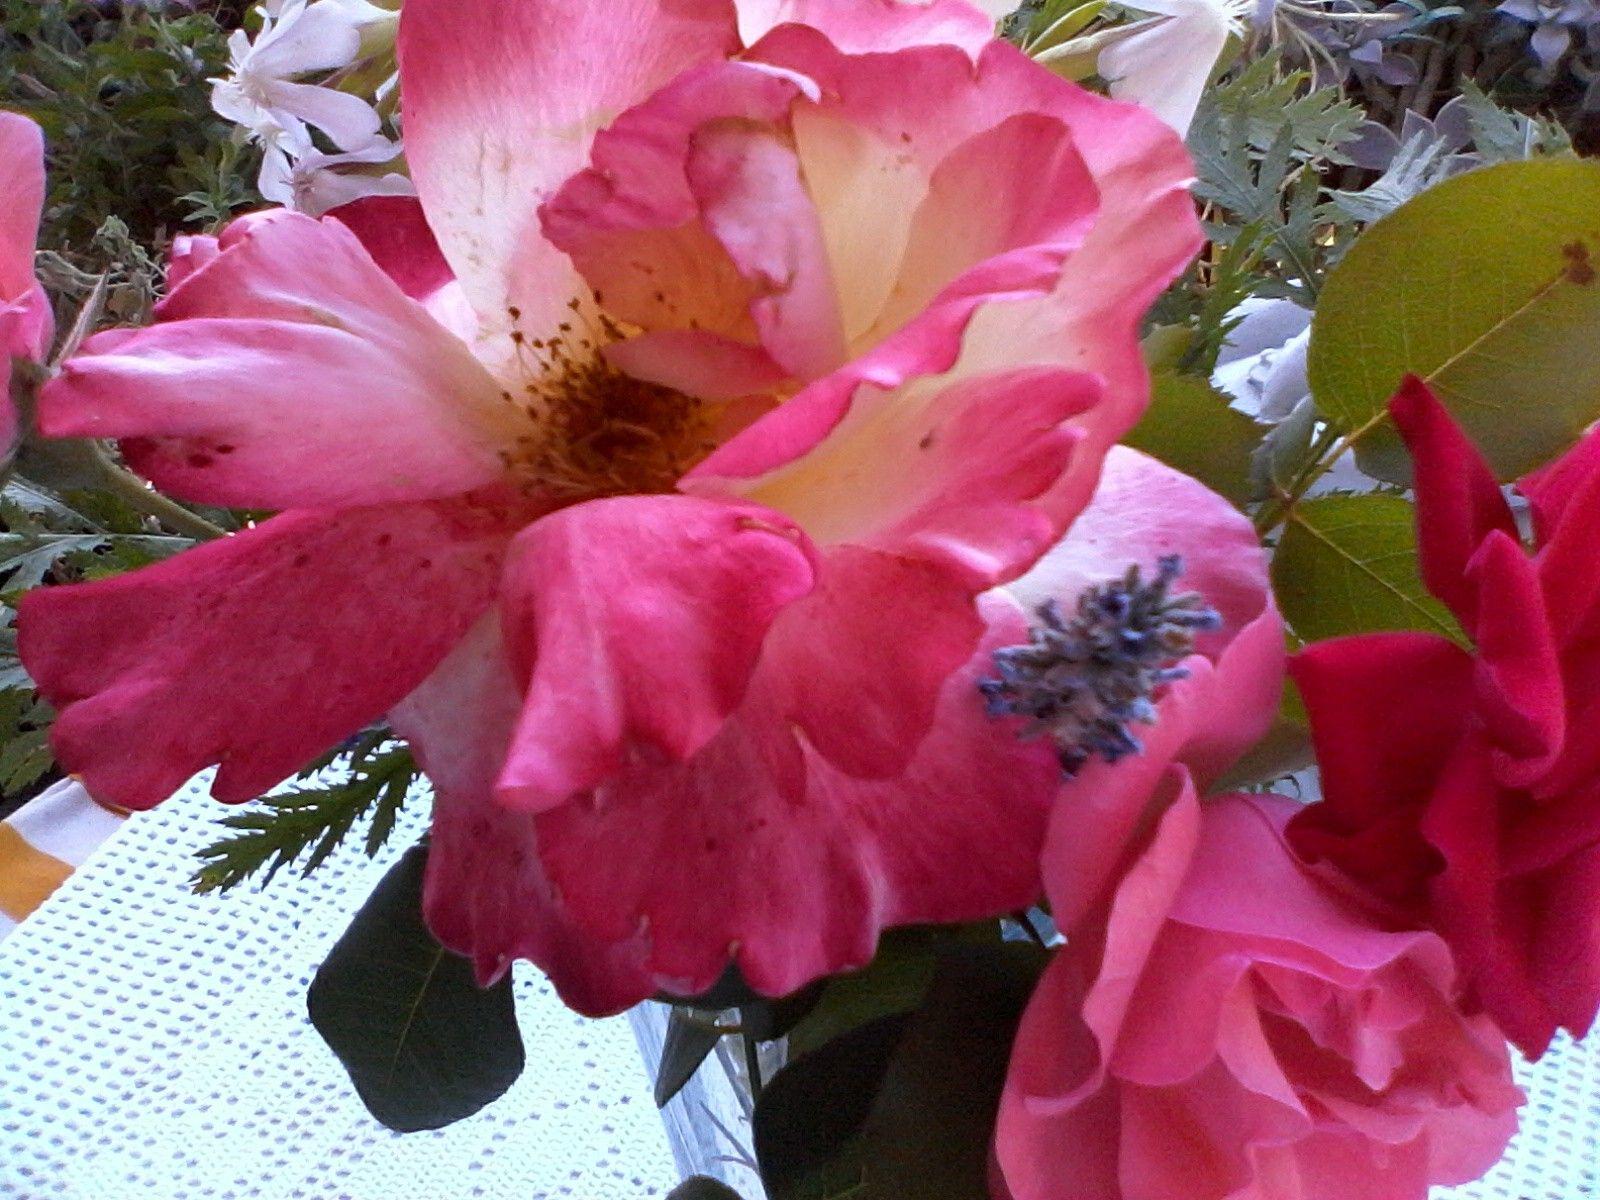 Rose appena colte dal mio giardino.